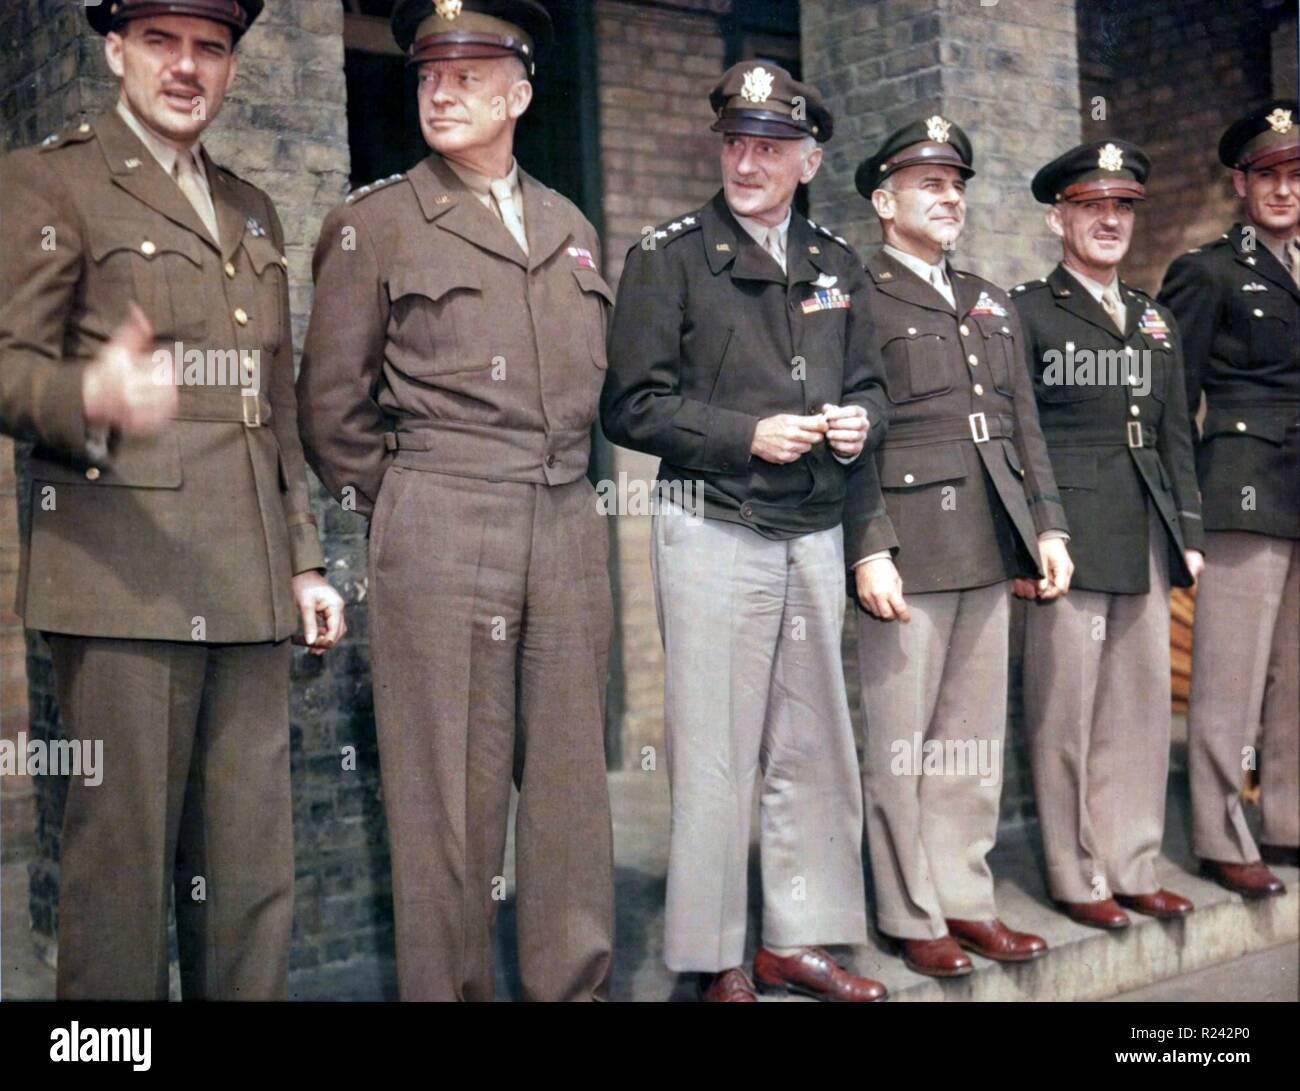 American World War Two Generals Jesse Auton, Eisenhower, Spaatz, Doolittle, Kepner and Colonel Blakeslee, 1944. Debden, England - Stock Image